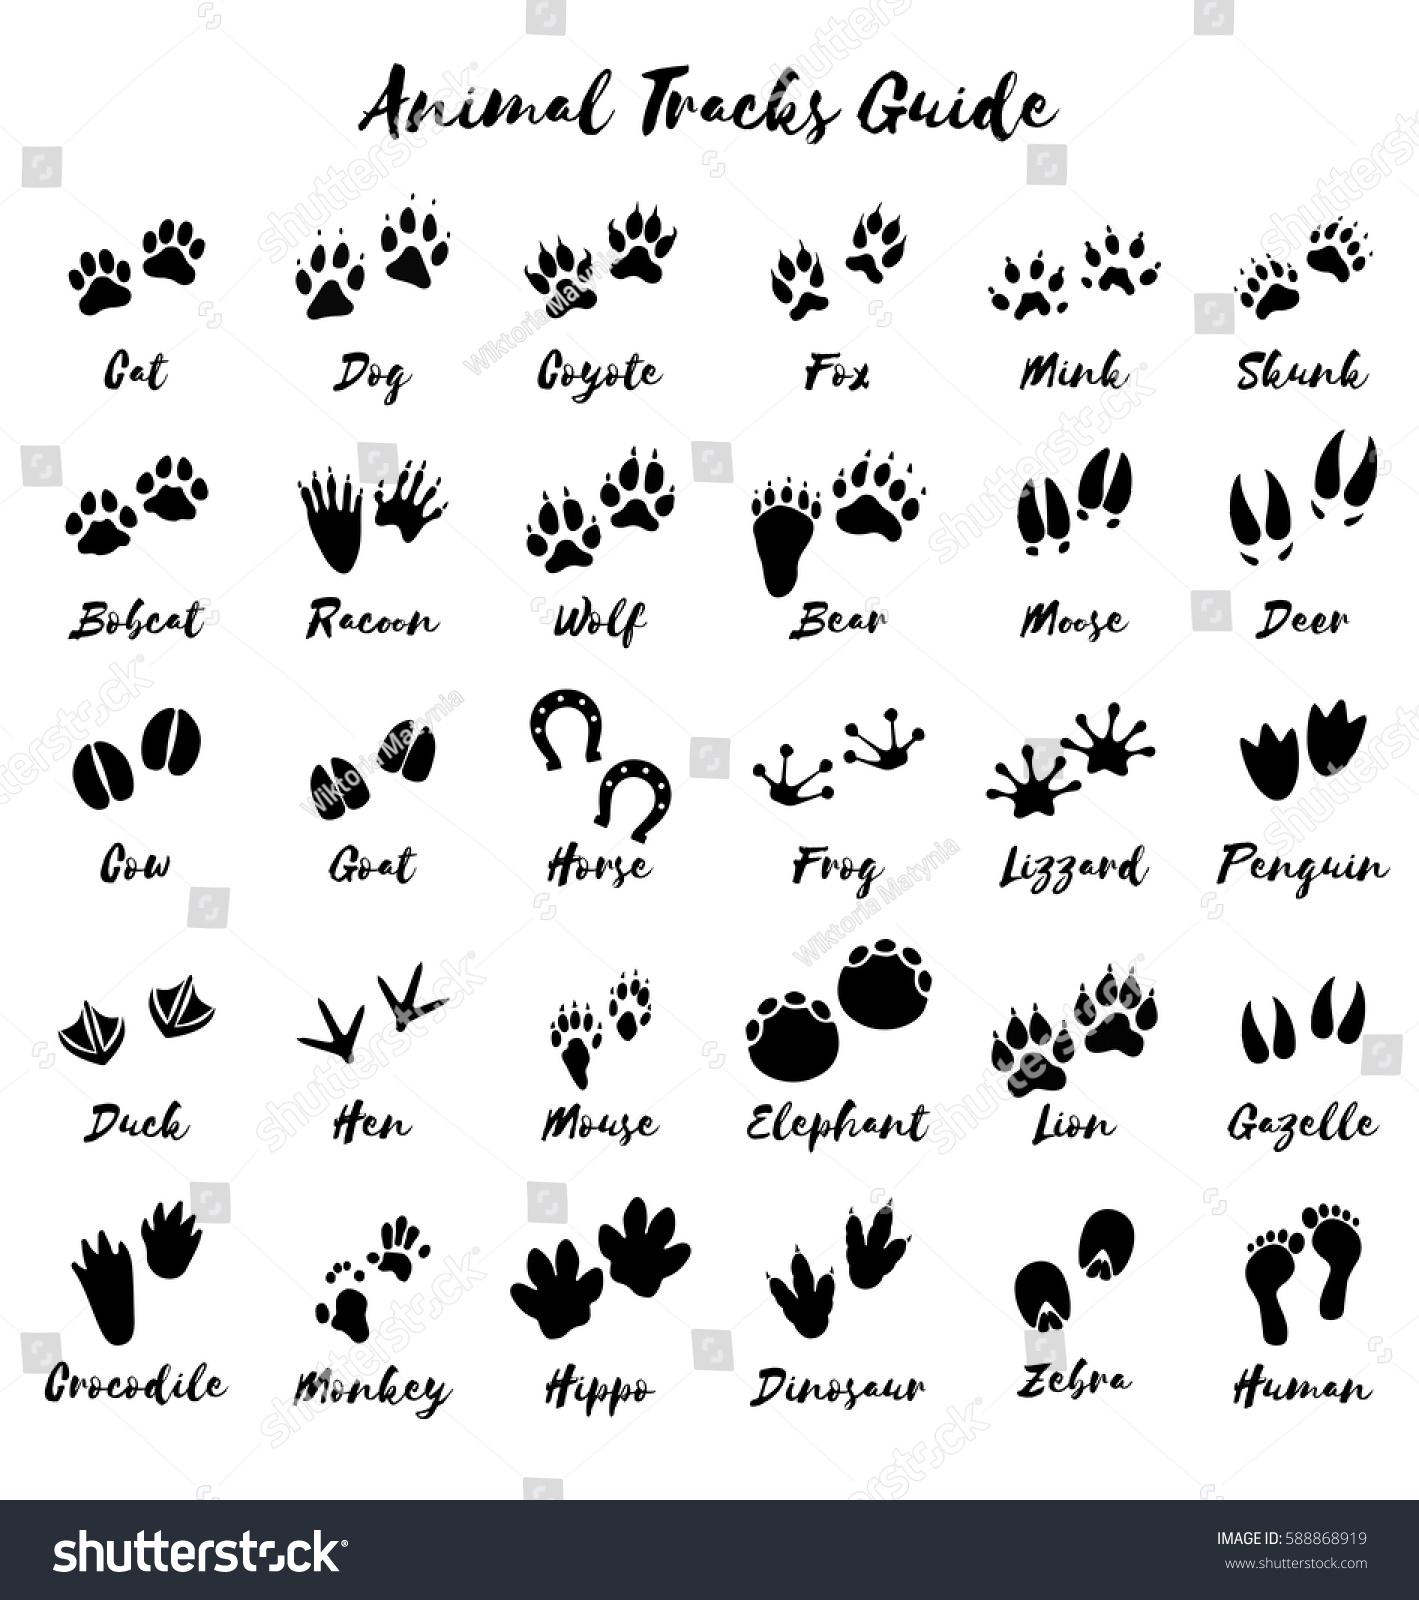 Animal Tracks Foot Print Guide Vector Stock Vector